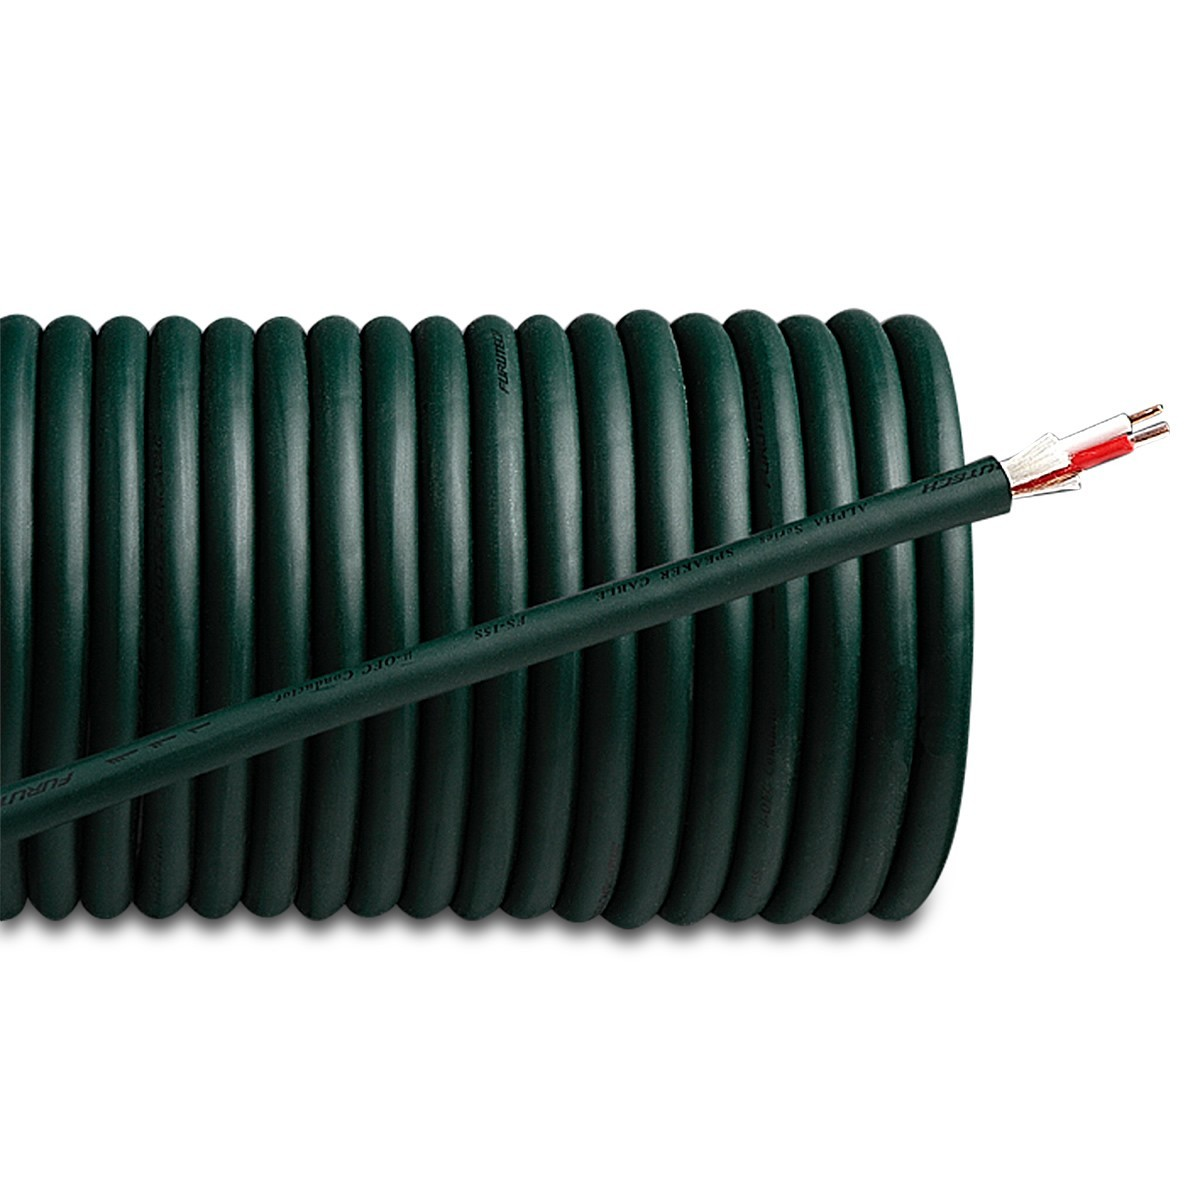 FURUTECH FS-15S Câble HP Cuivre OFC (SolidCore Alpha) 2x1.6mm² Ø 8.2mm